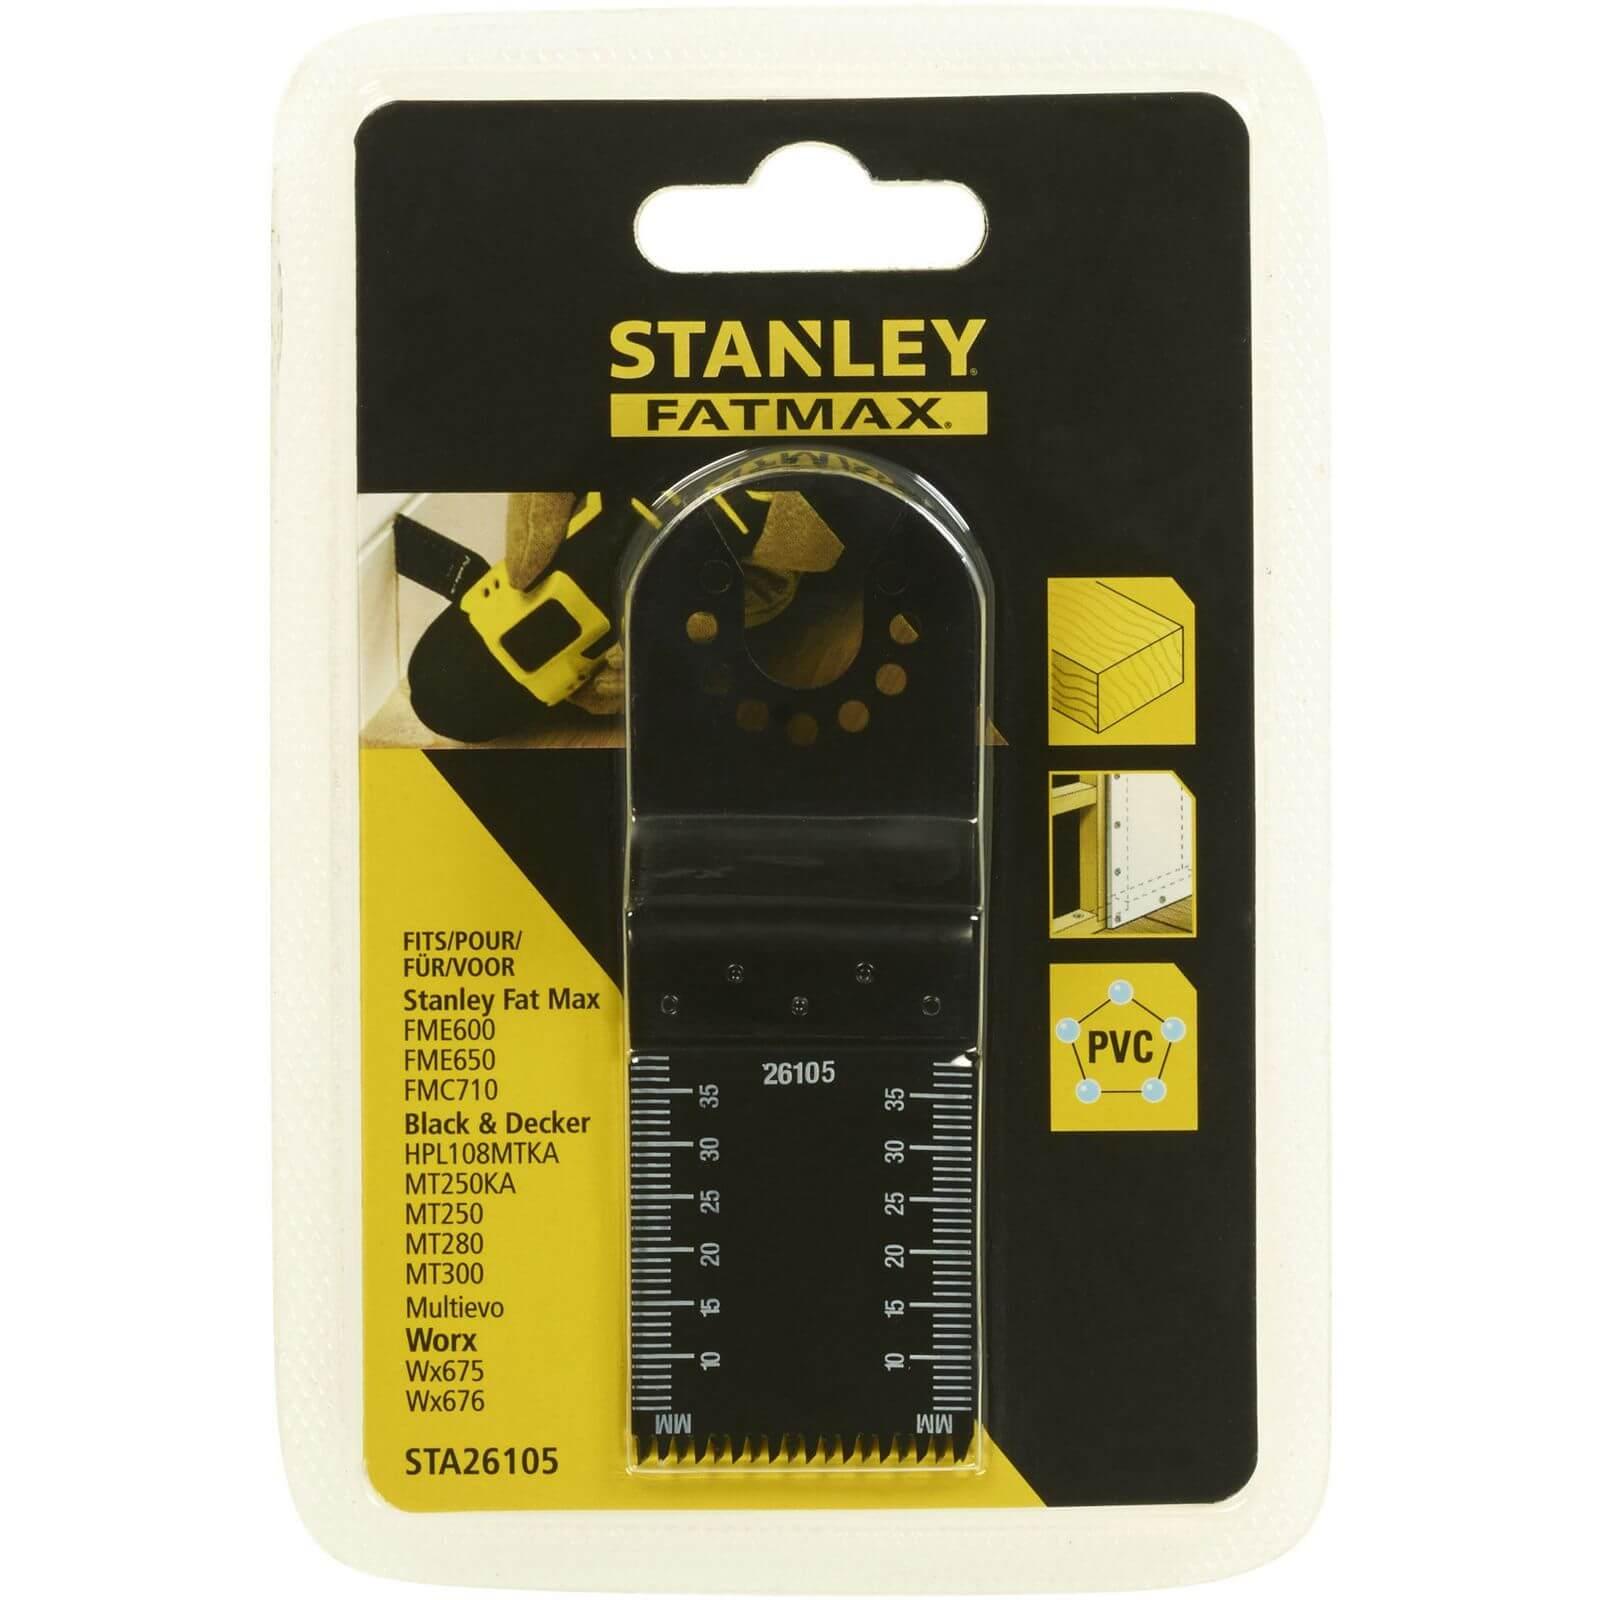 Stanley Fatmax 32x40mm HCS Wood Plungecut - STA26105-XJ